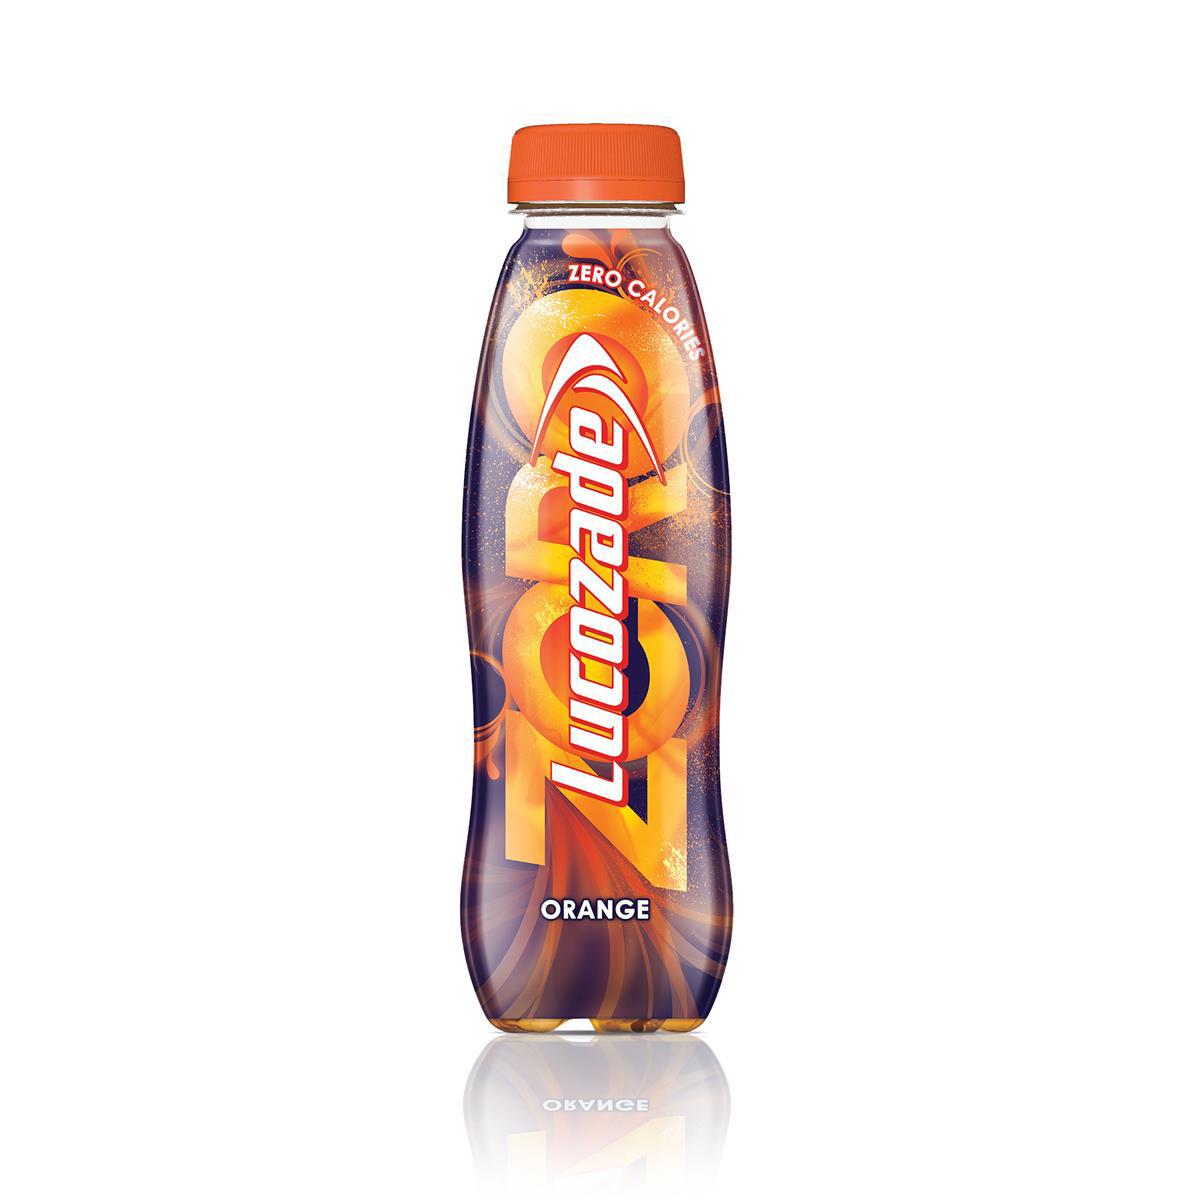 Lucozade Zero Orange Low Calorie Soft Drink Bottle Plastic 380ml Ref 96716 [Pack 24]